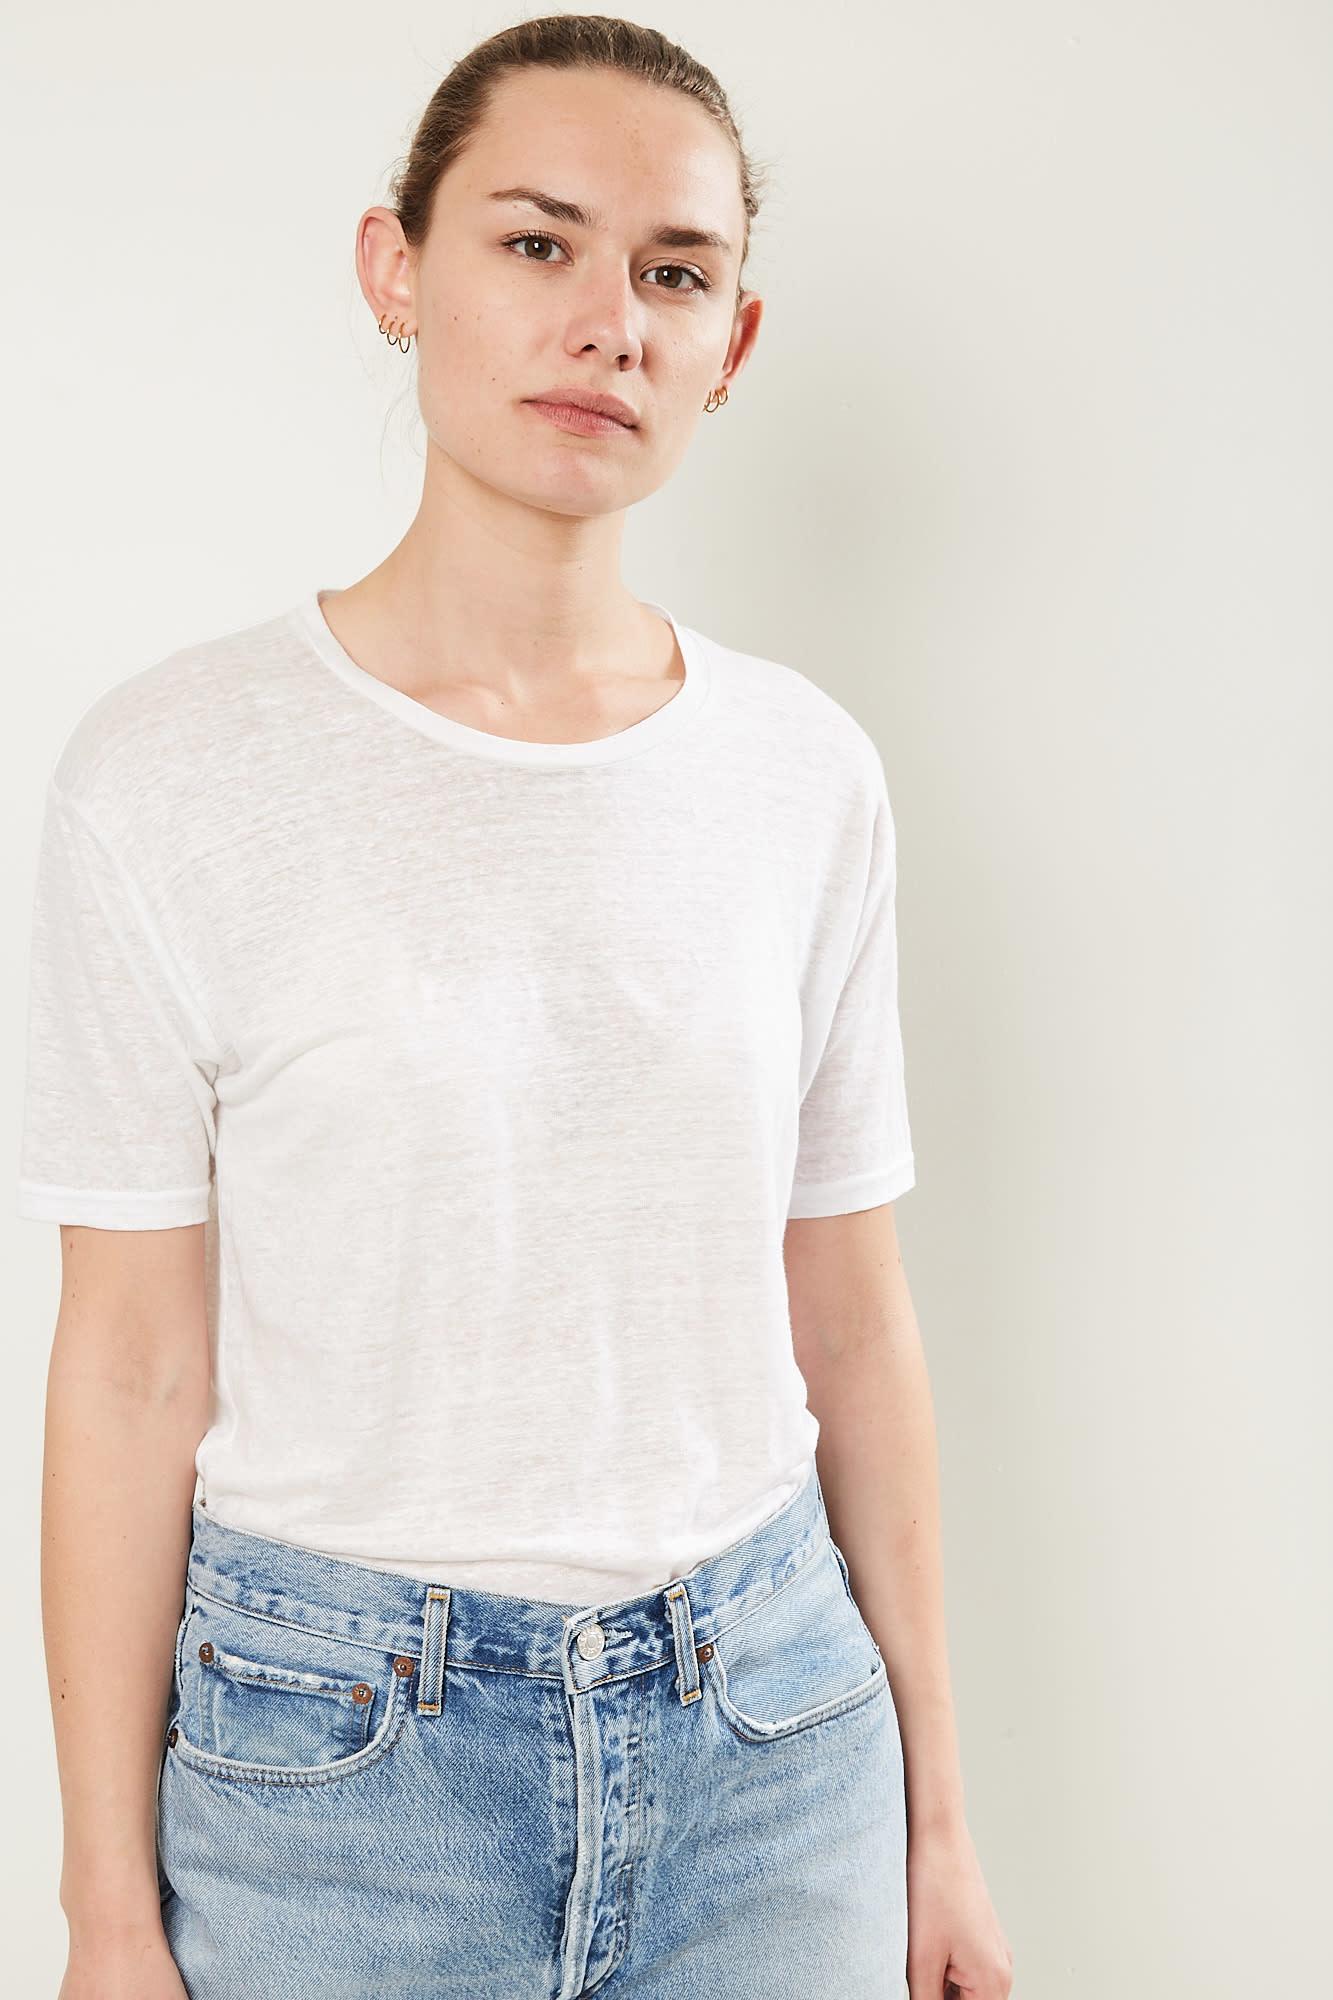 Isabel Marant madjo tee shirt white